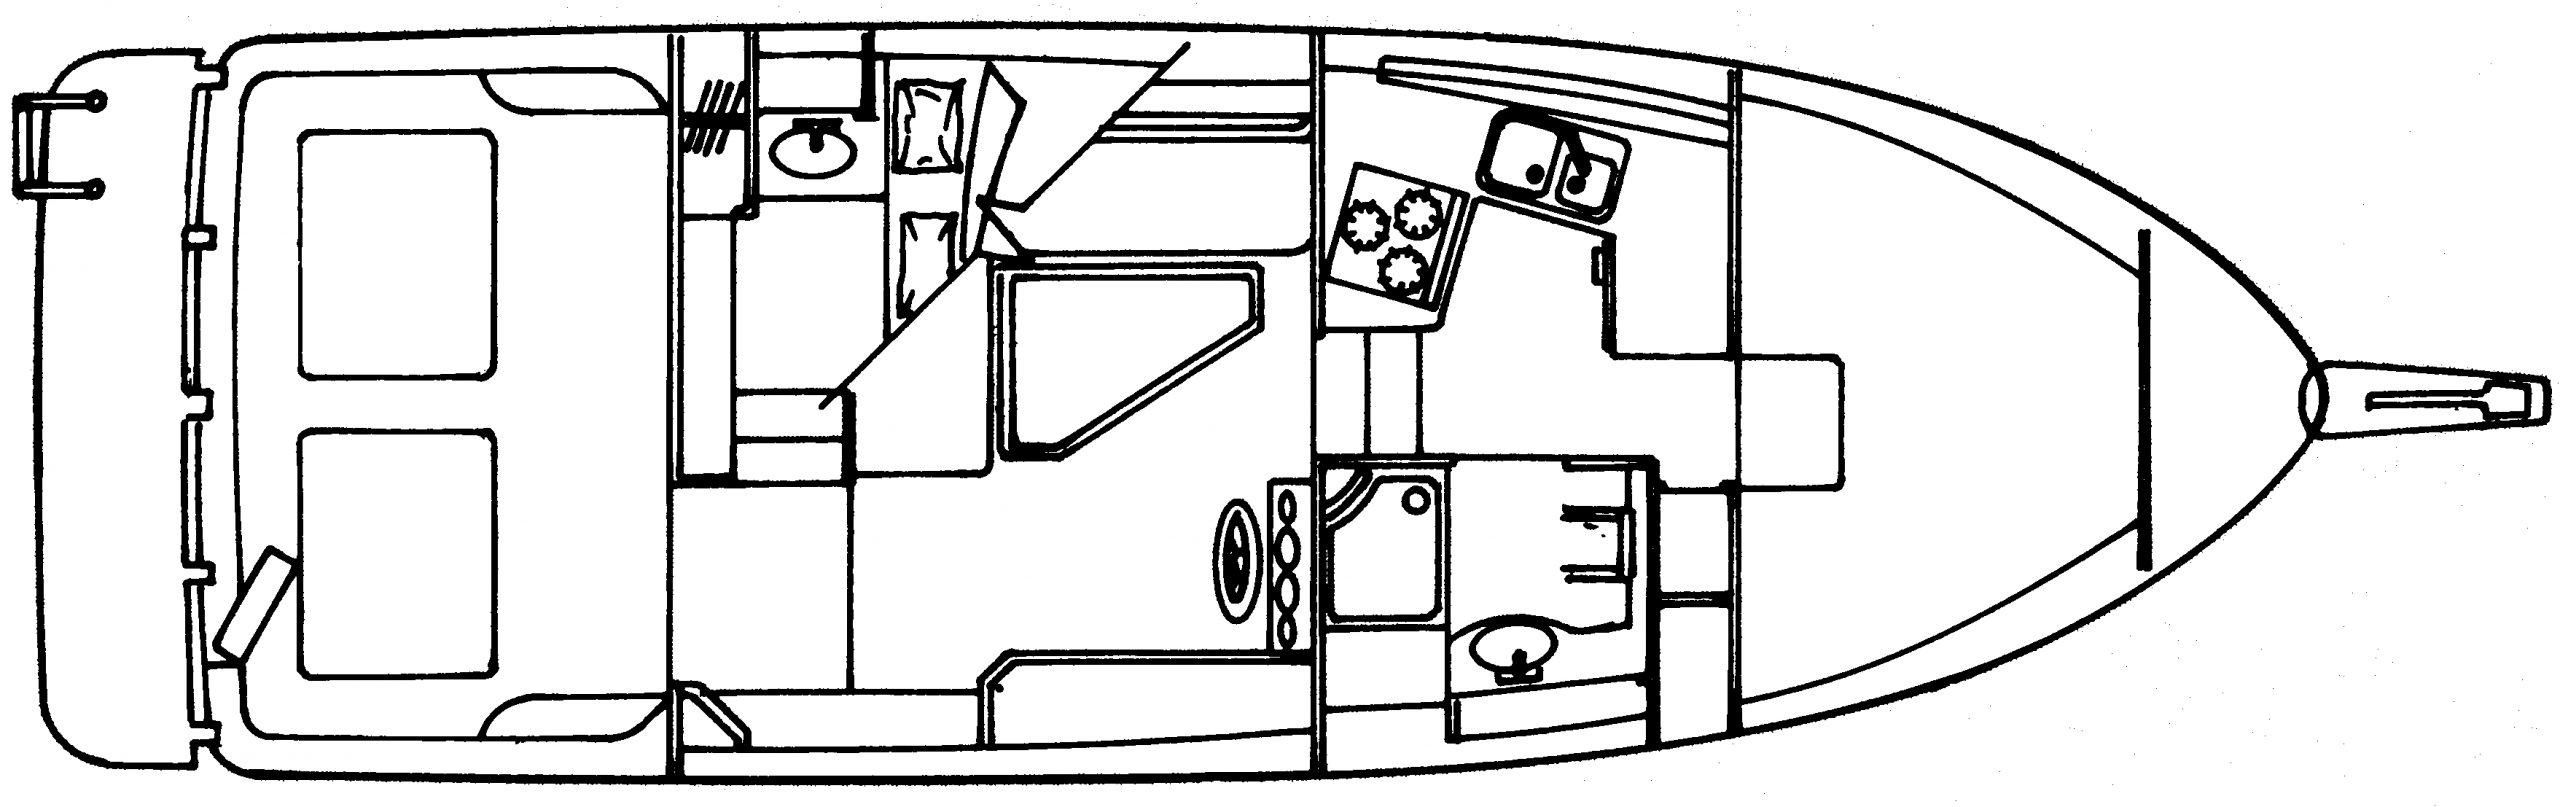 3388 Motor Yacht Floor Plan 1